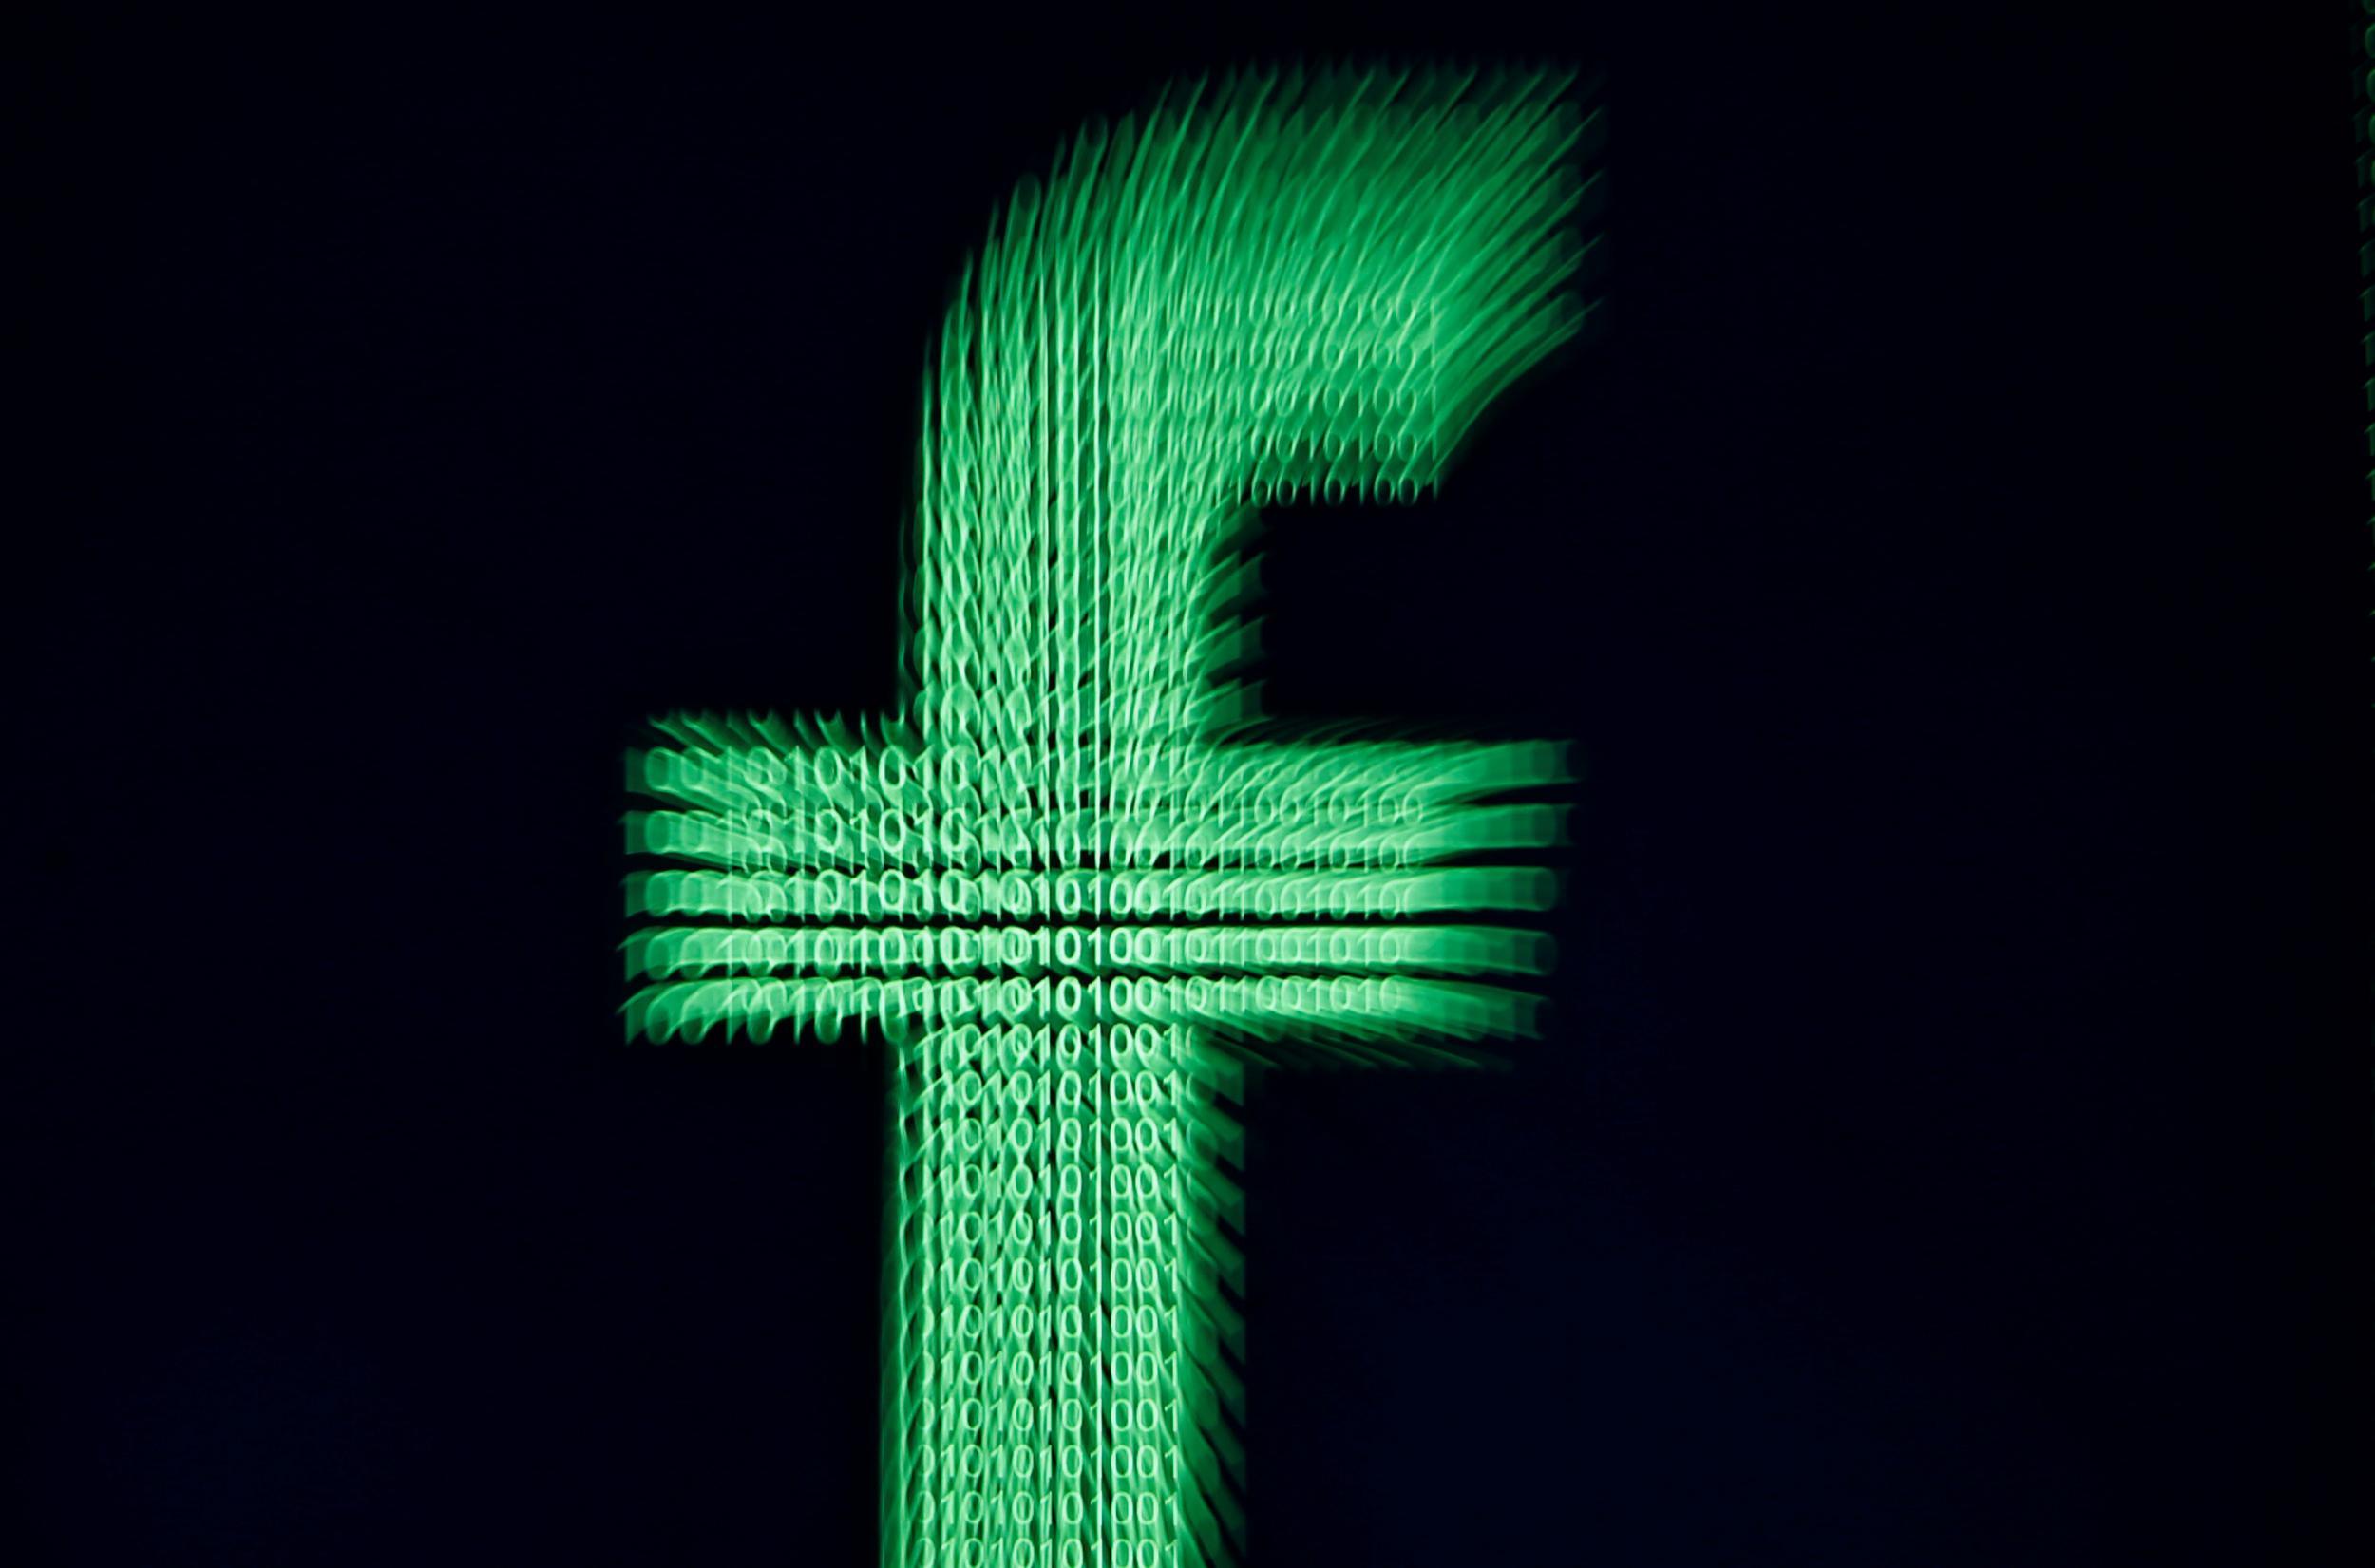 Cyber criminals earn $1.5 trillion through Amazon, Facebook and Instagram exploitation